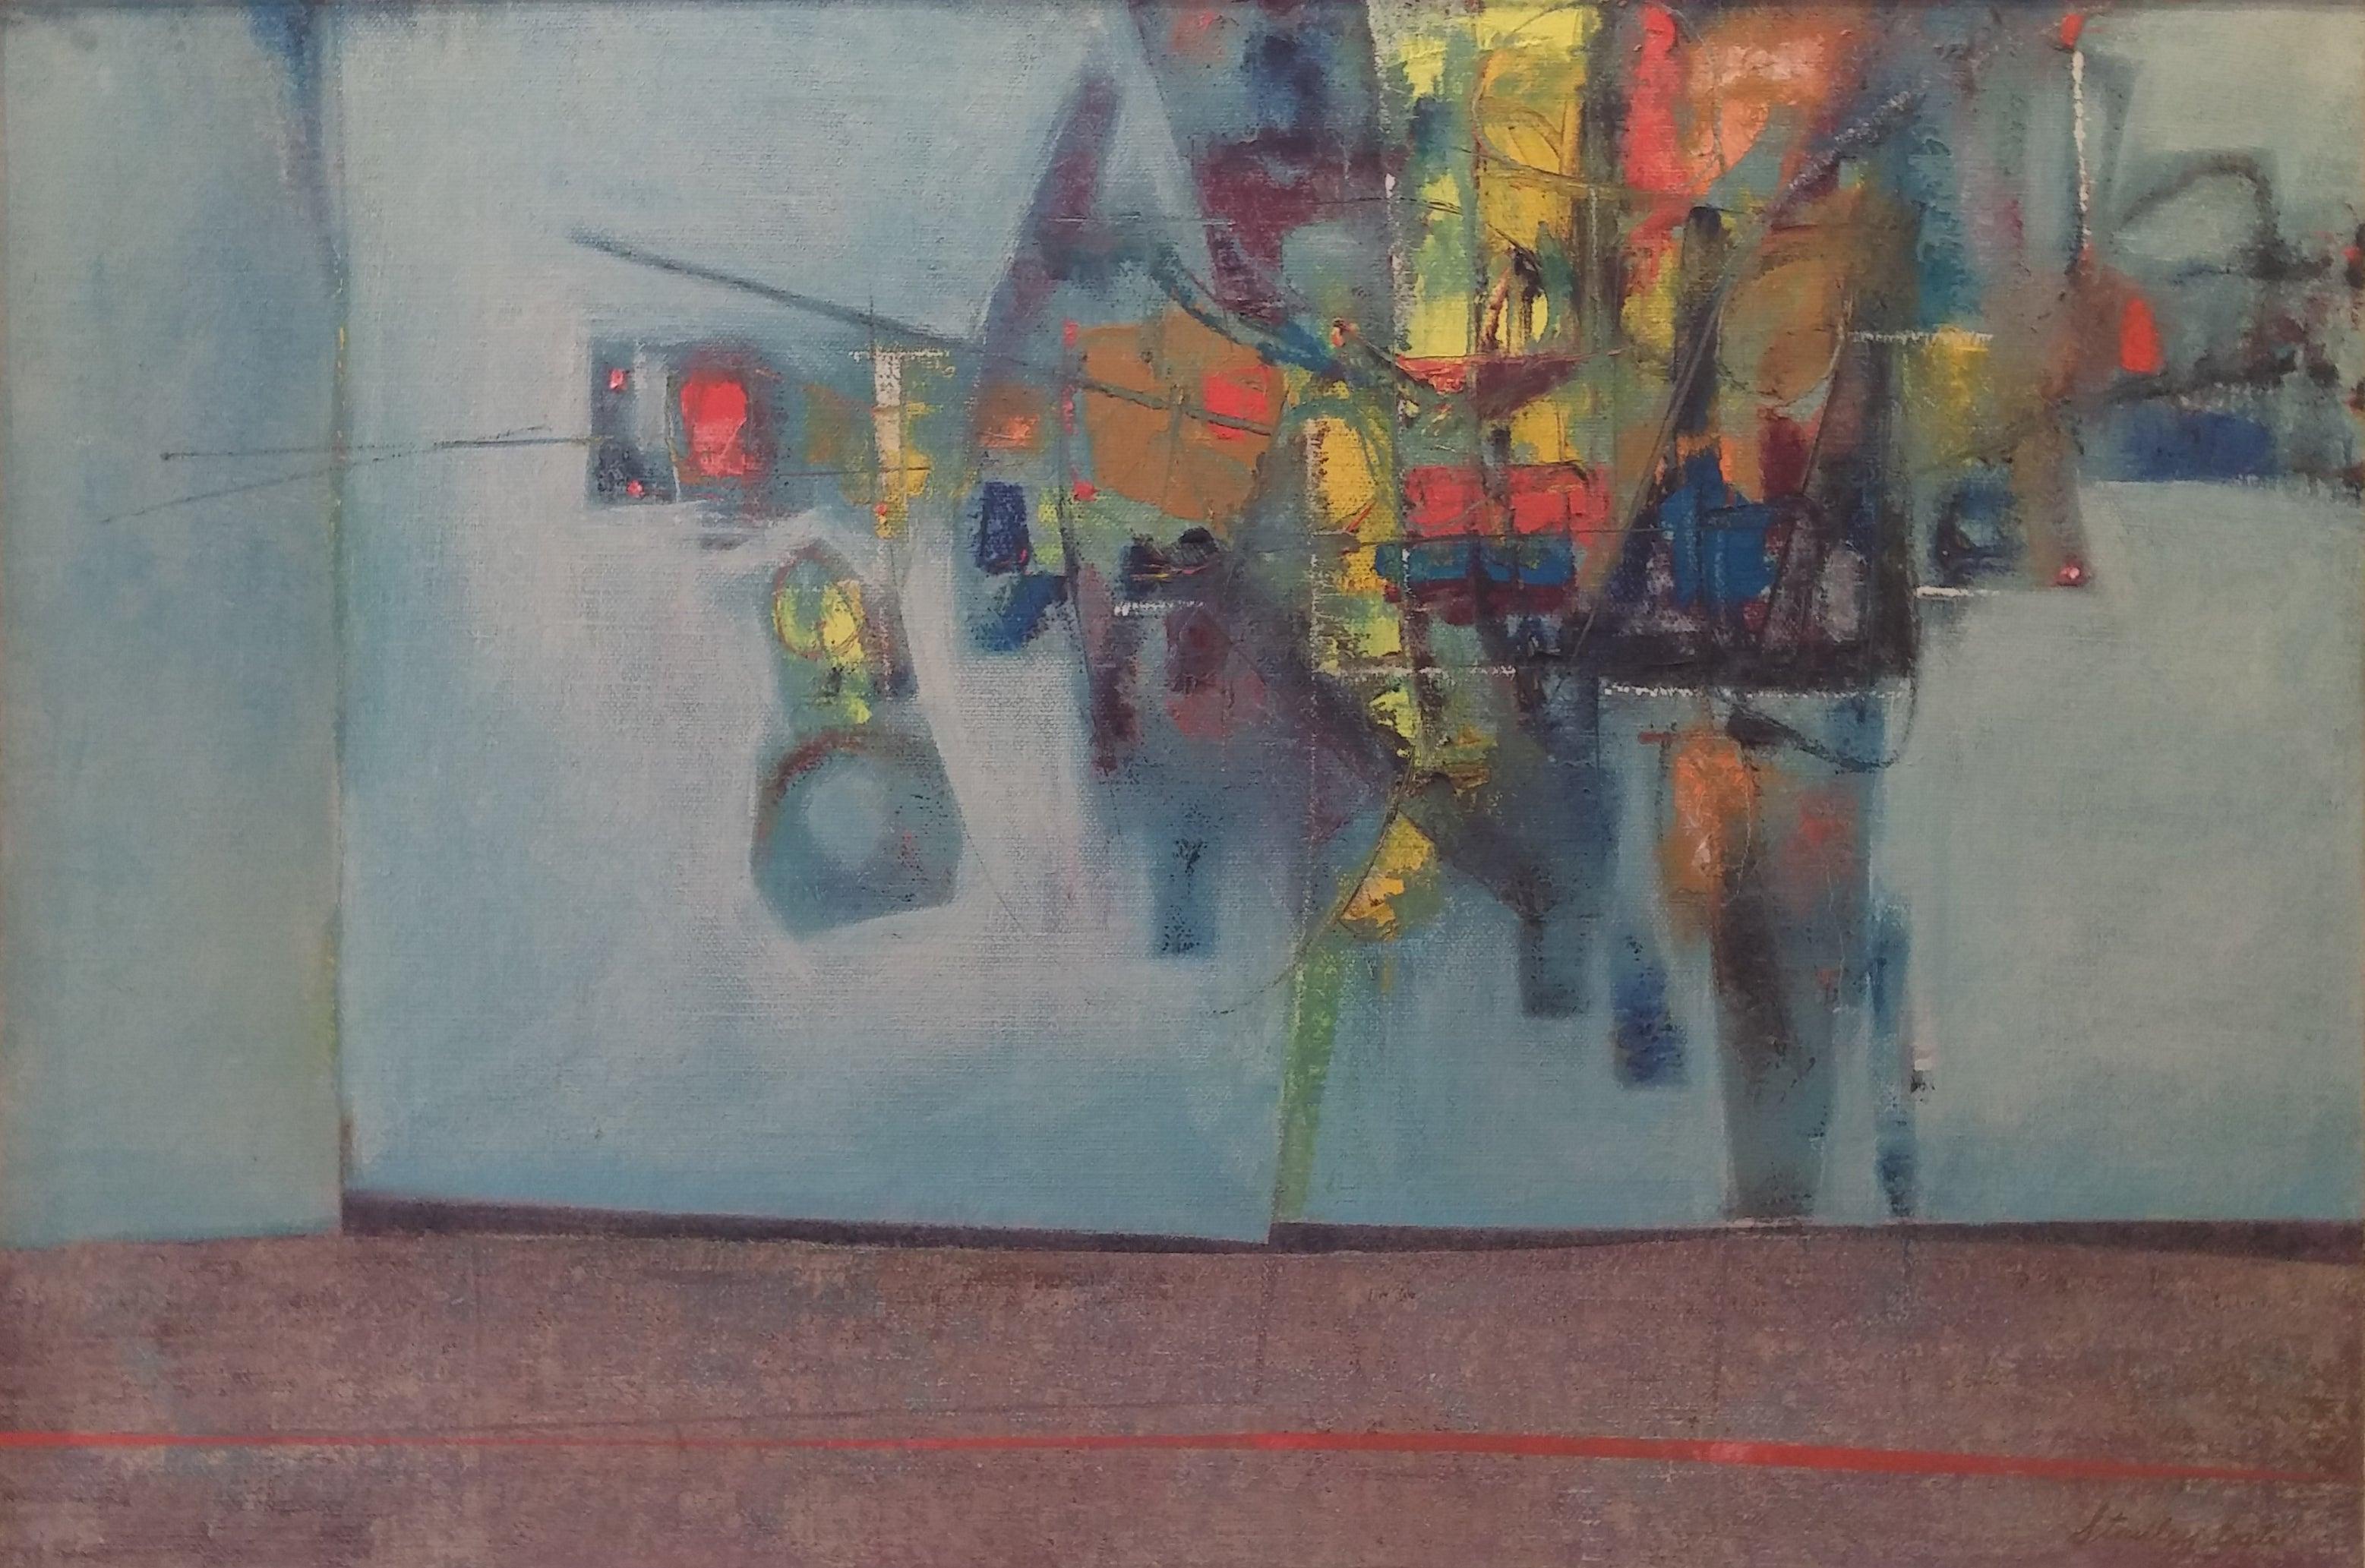 Stanley Bate - Pas De Deux, Painting im Angebot bei 1stdibs